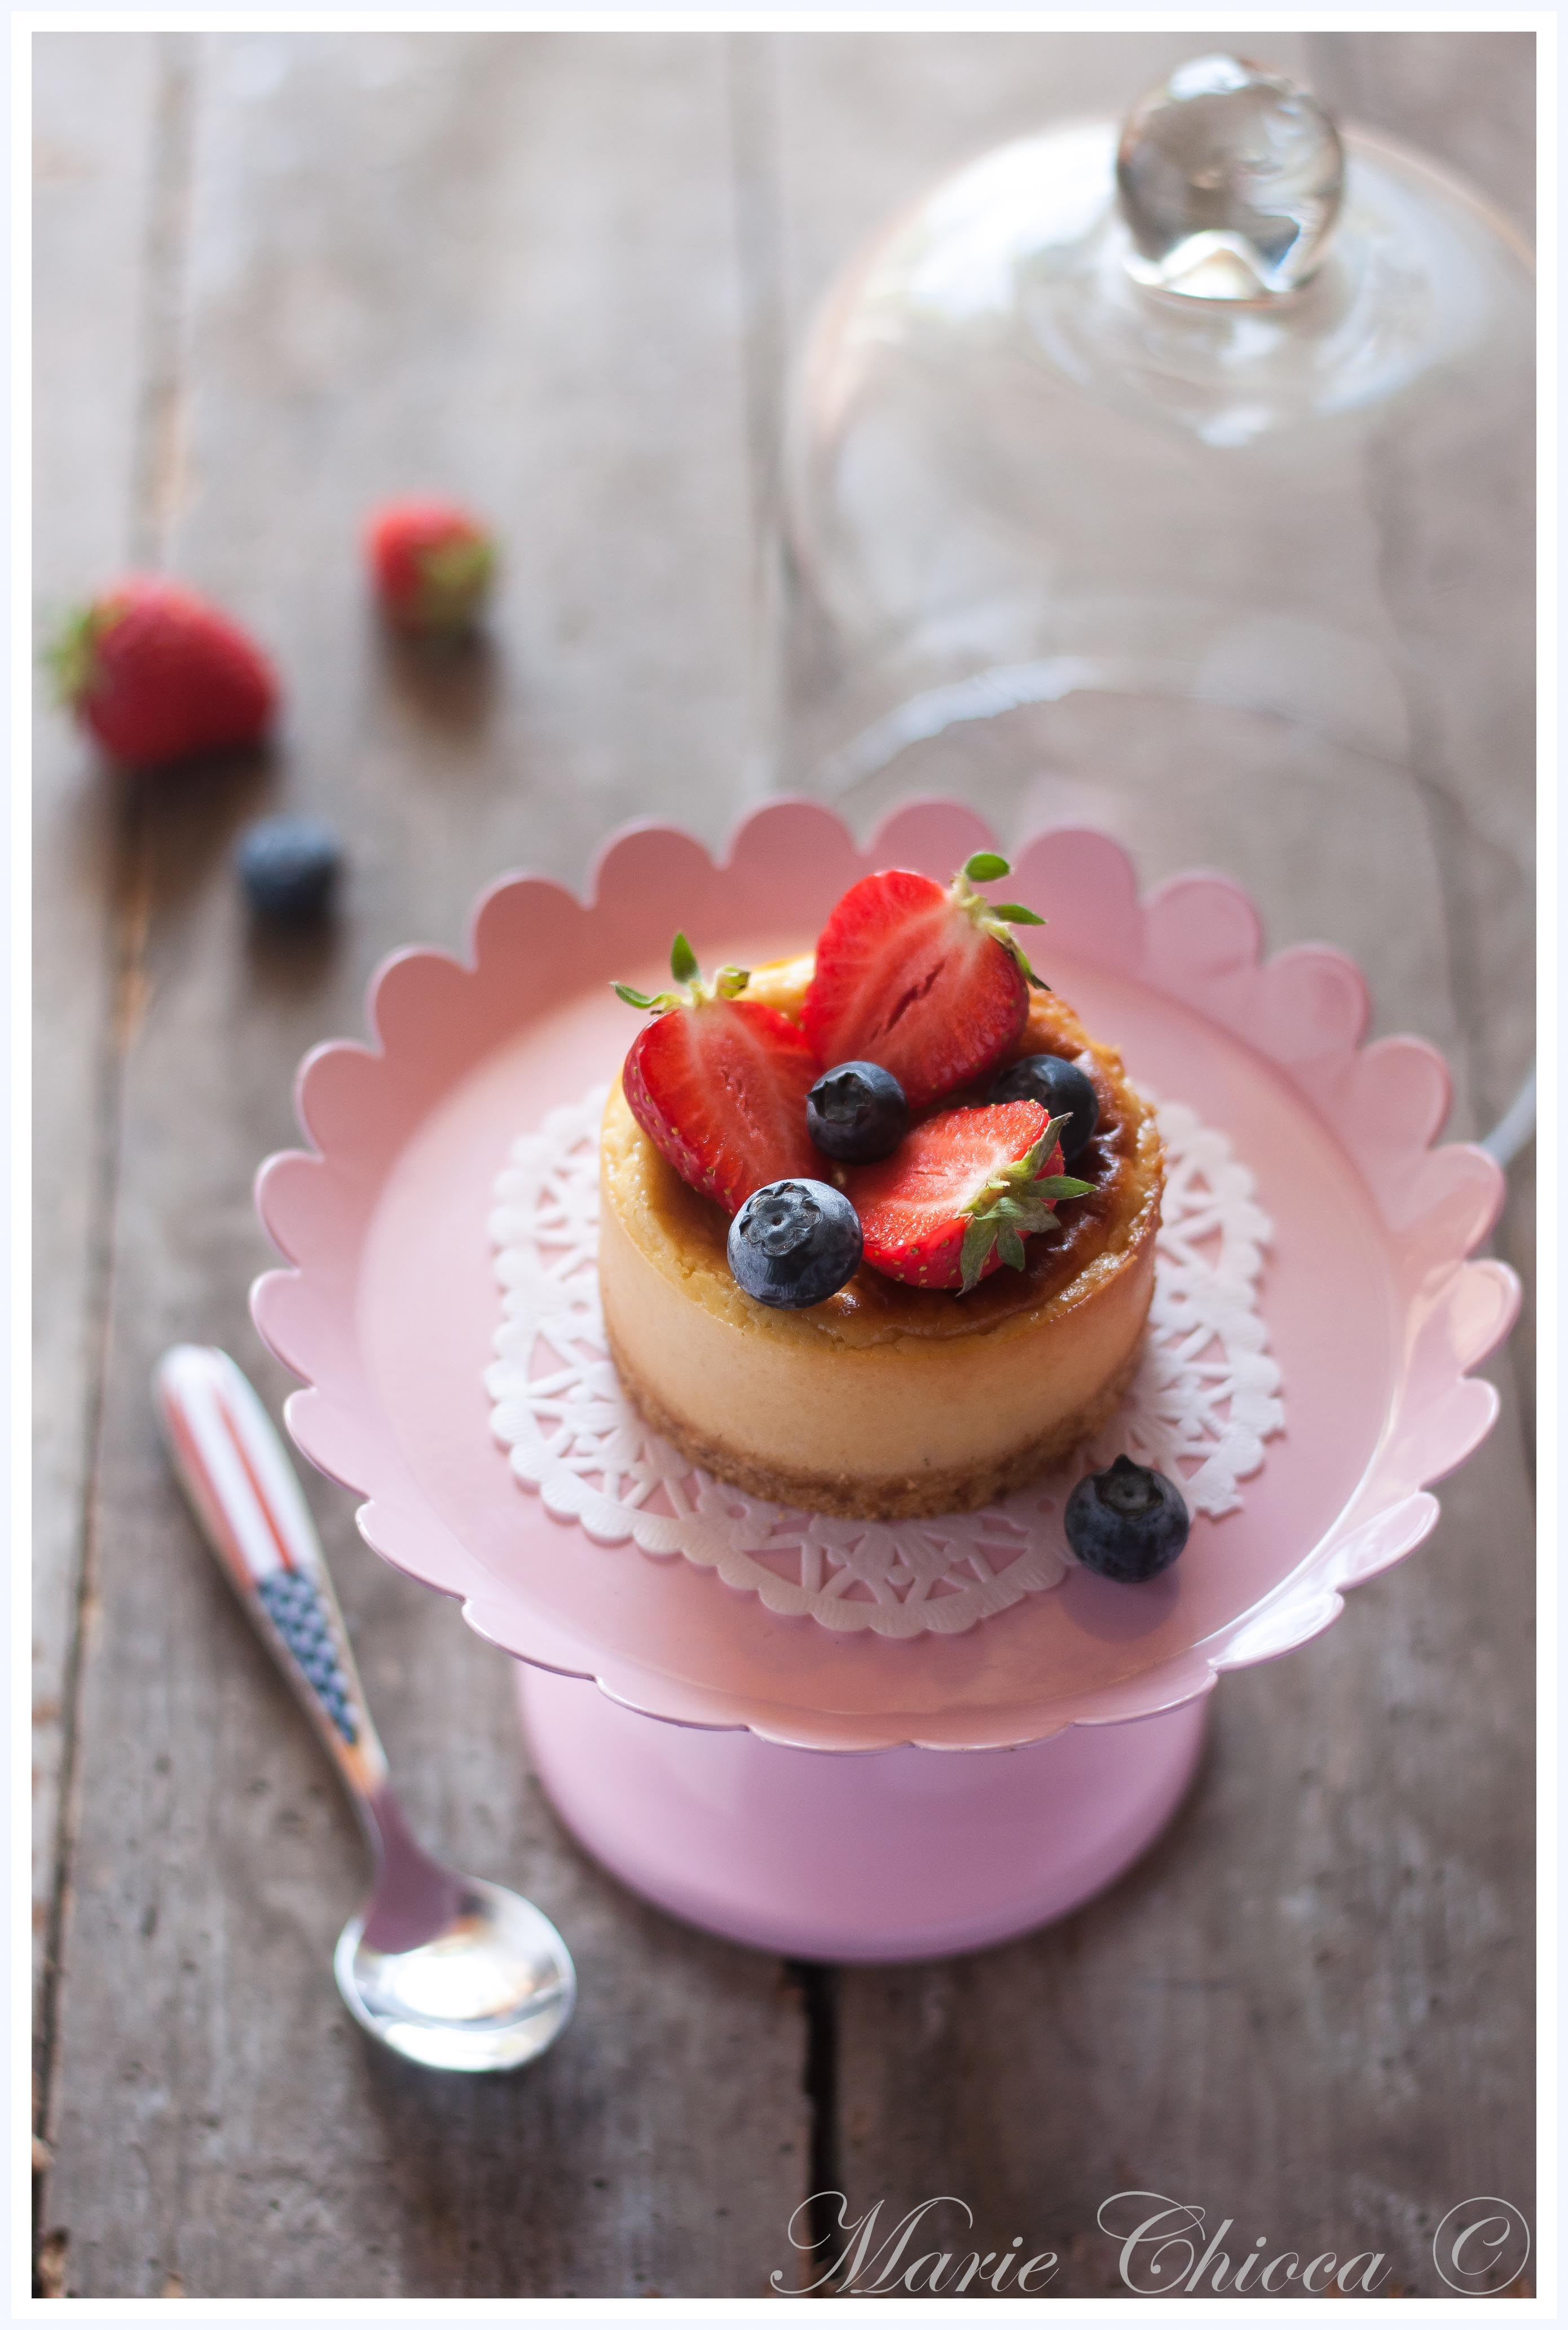 mini-cheesecakes-au-tofu-soyeux-et-a-l-amande-blanche-2